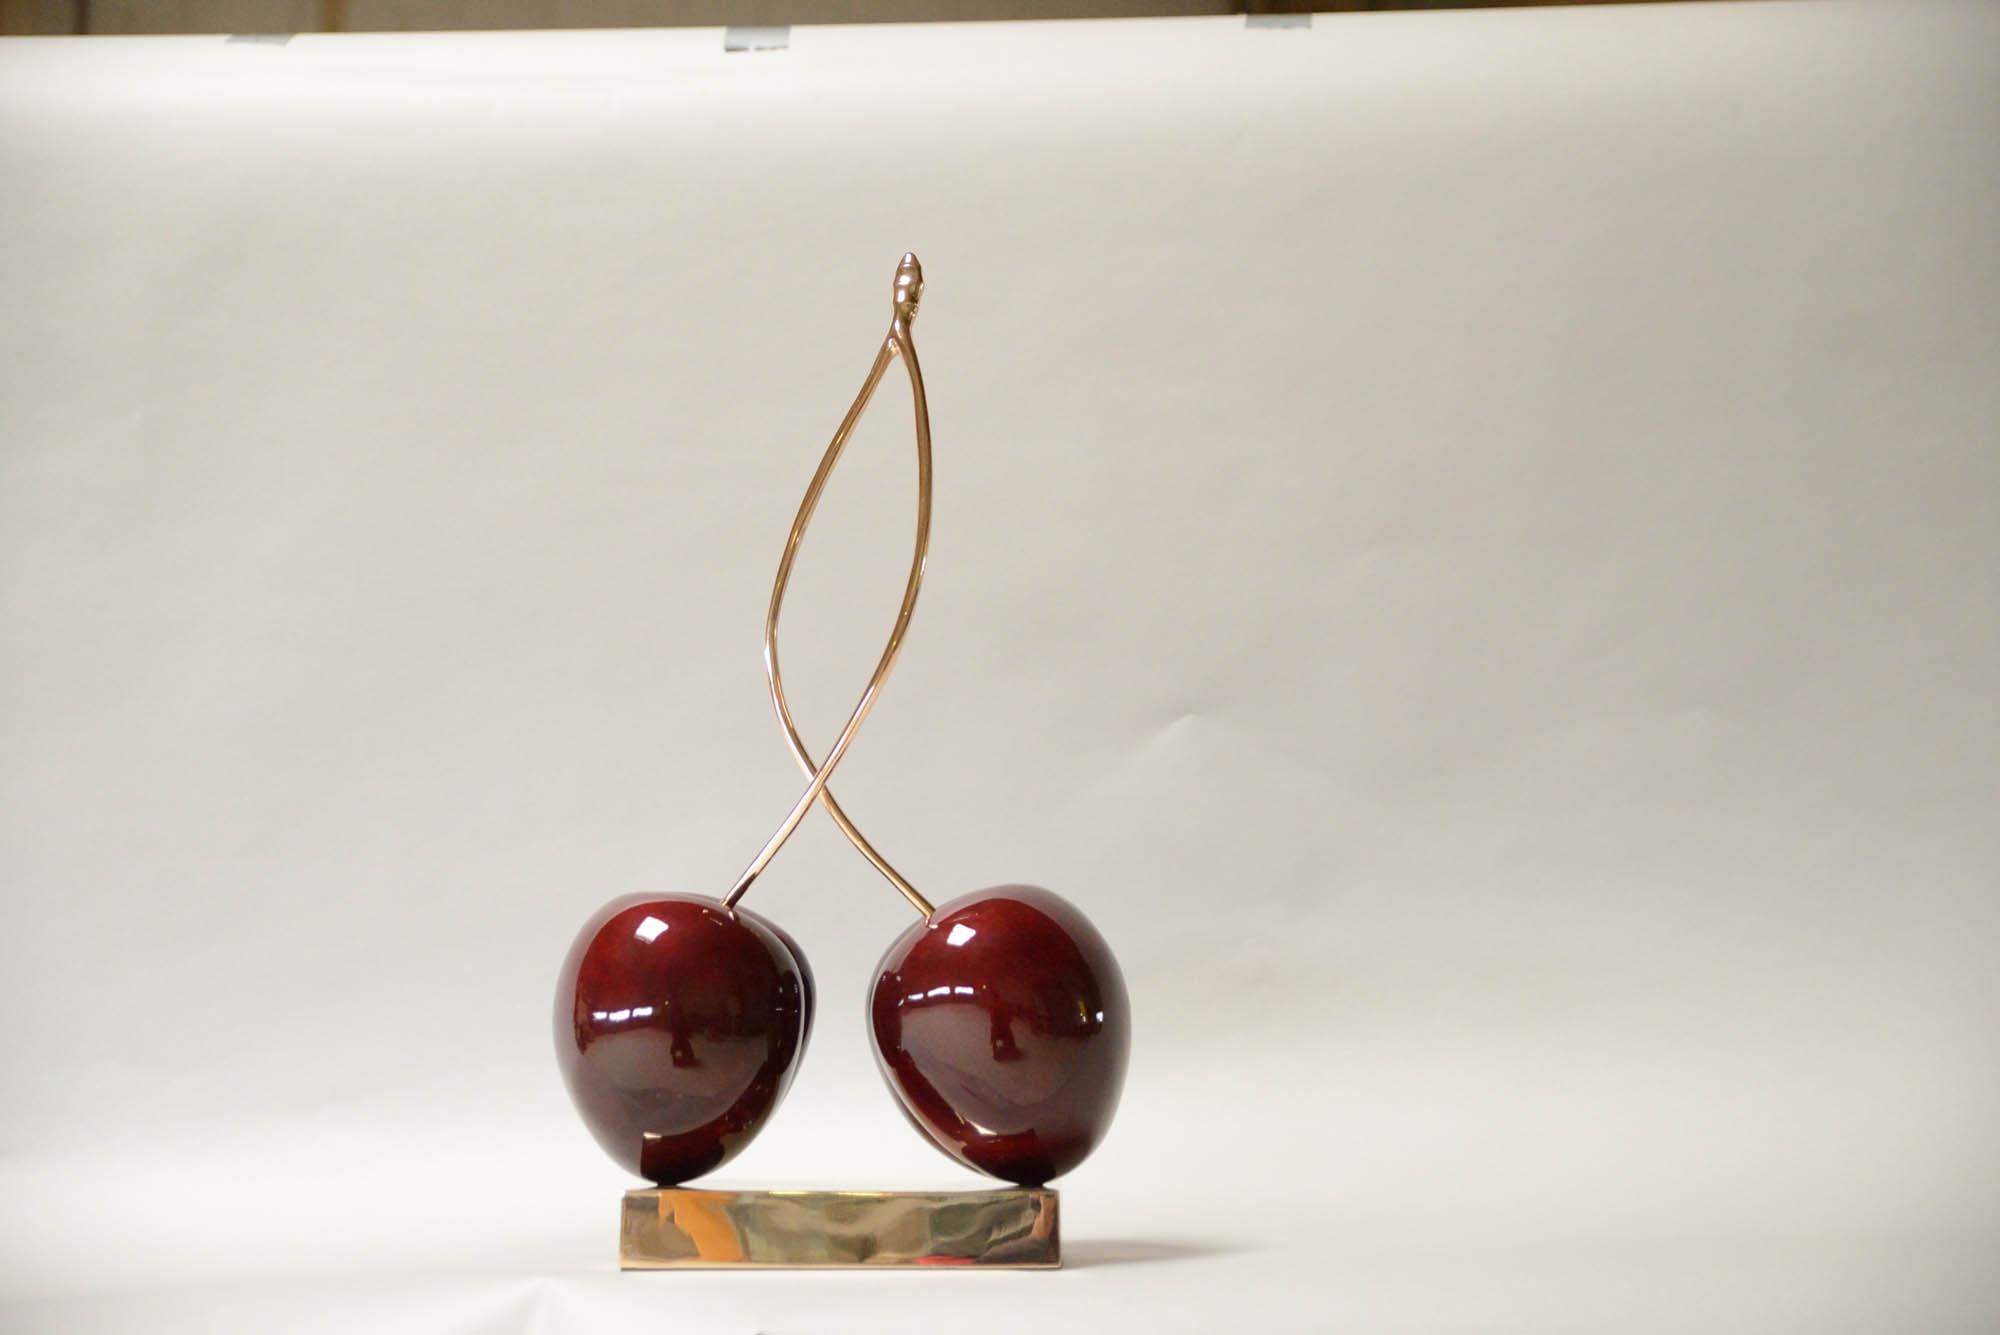 fruit-cherries-love-cherry-ii-